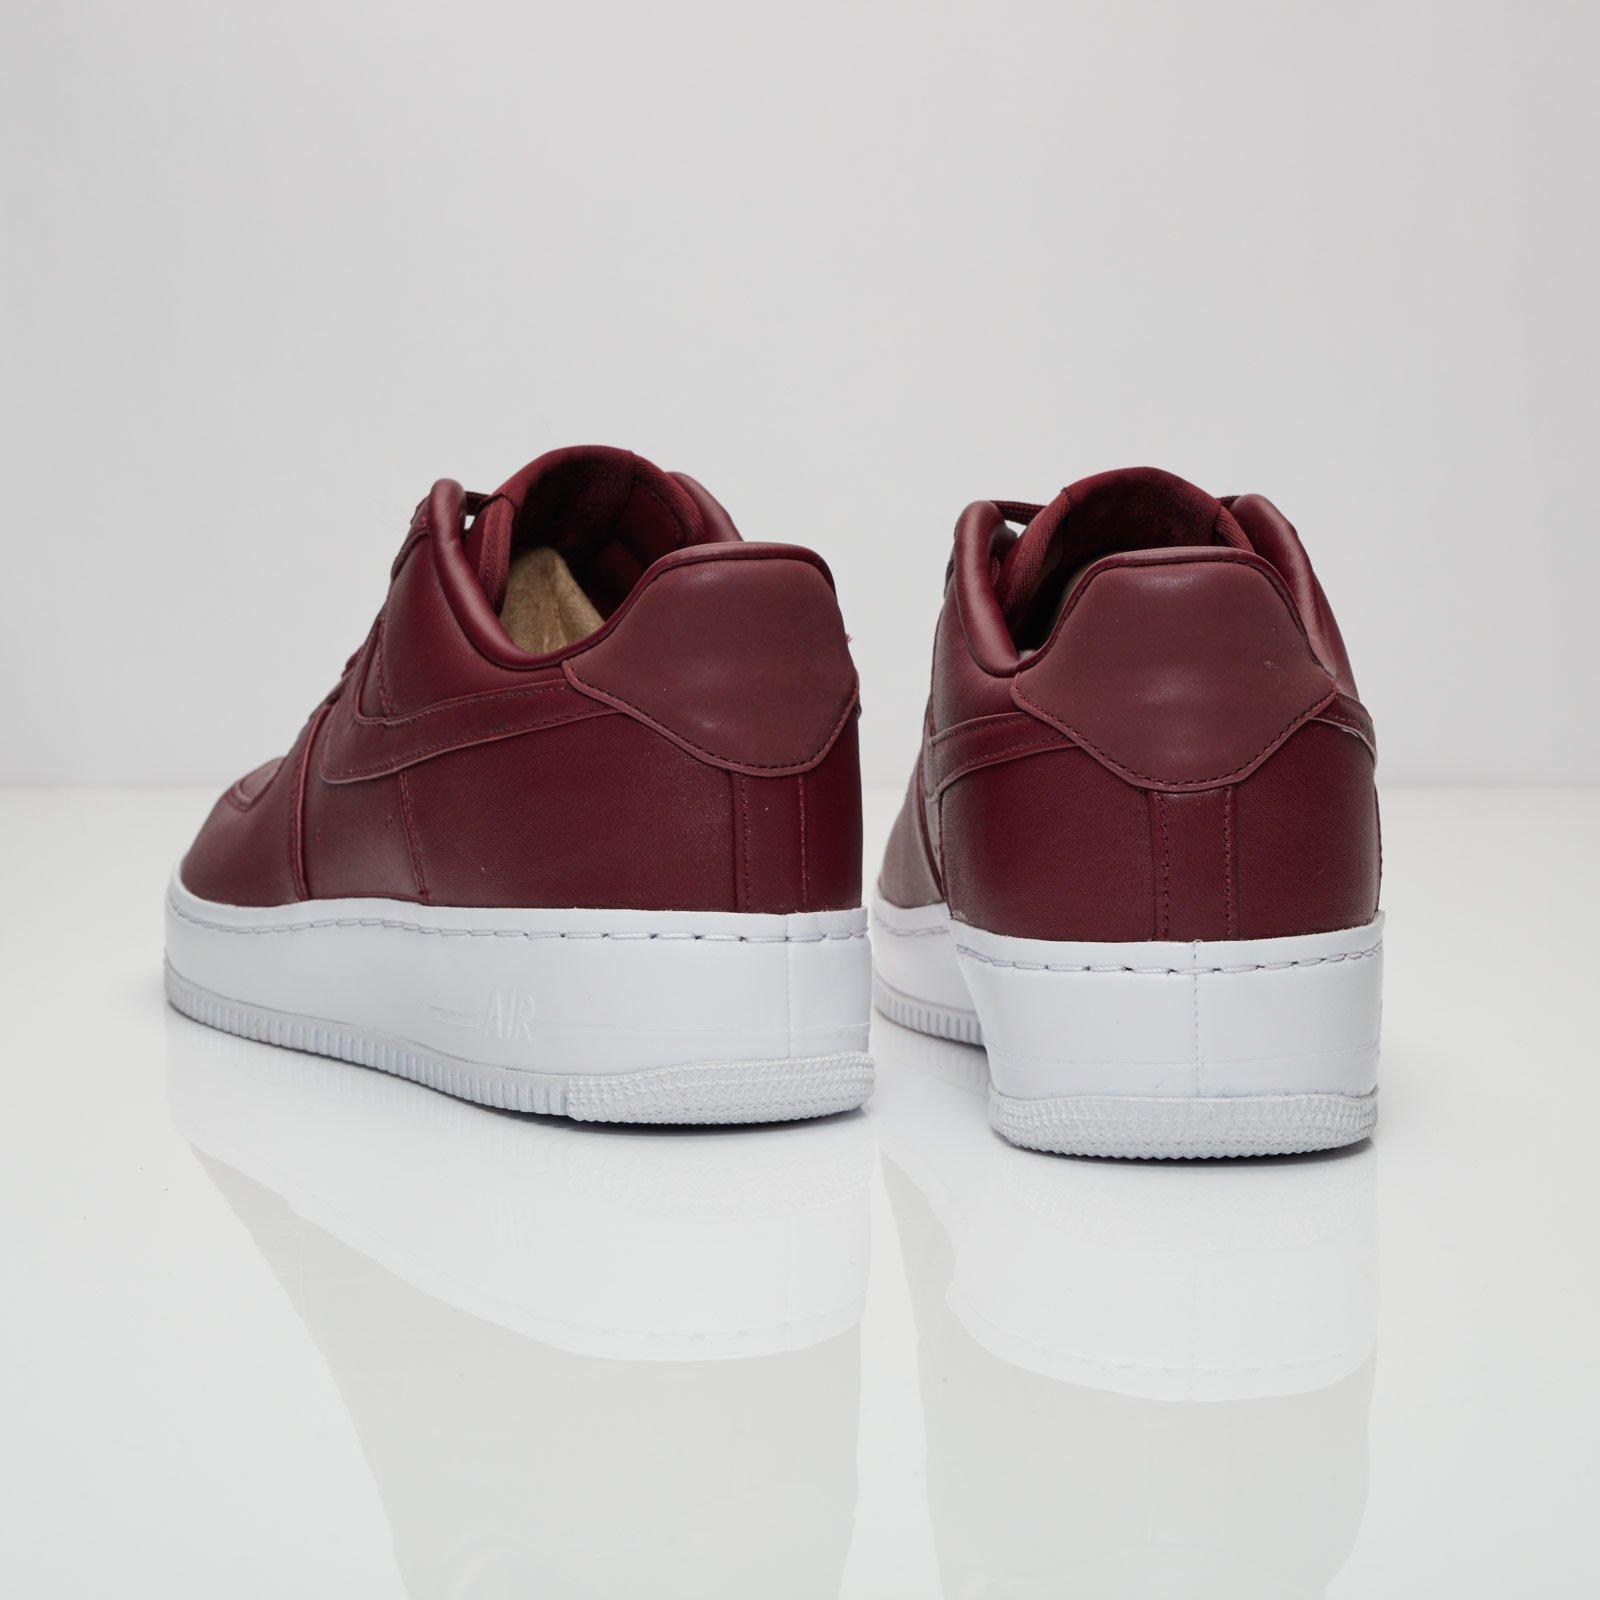 new arrival b1cd0 22954 Nike Air Force 1 Low - 555106-661 - Sneakersnstuff ...